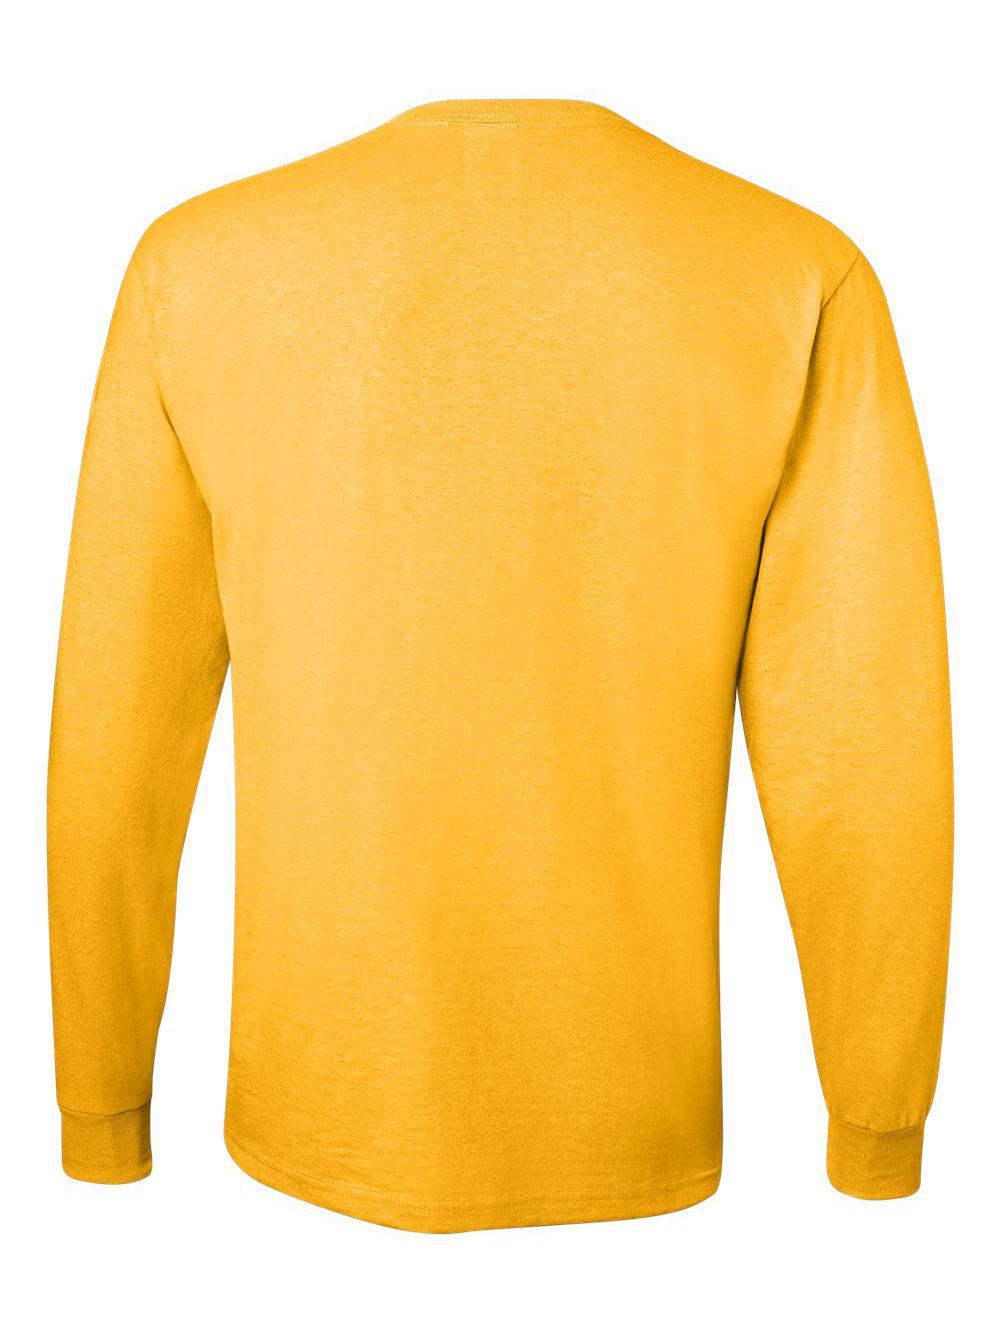 Jerzees-Dri-Power-Long-Sleeve-50-50-T-Shirt-29LSR thumbnail 43